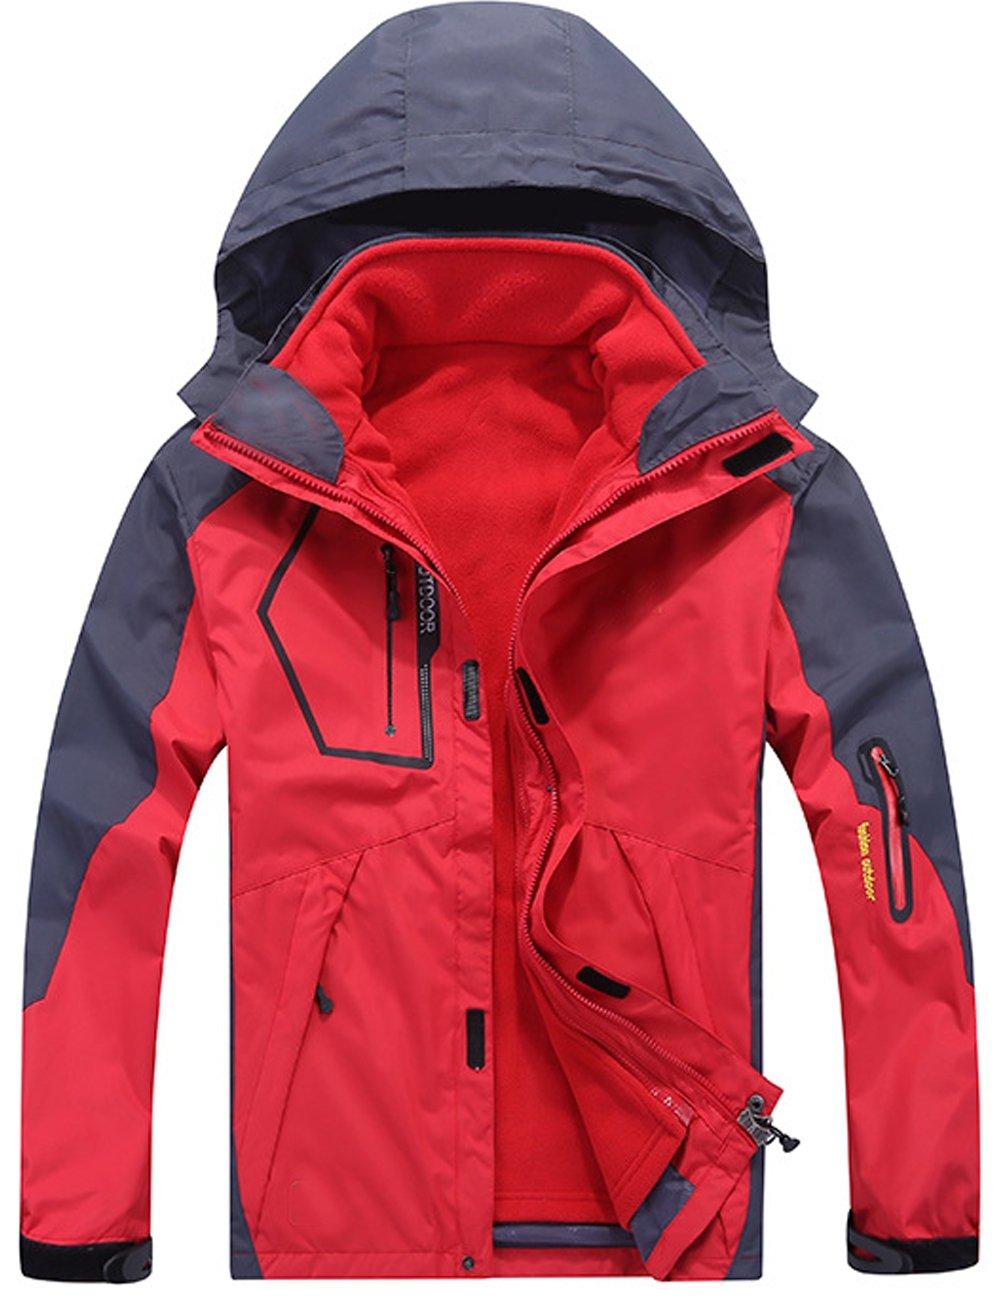 Menschwear OUTERWEAR メンズ B077C4HYBC M|Red W1201 Red W1201 M